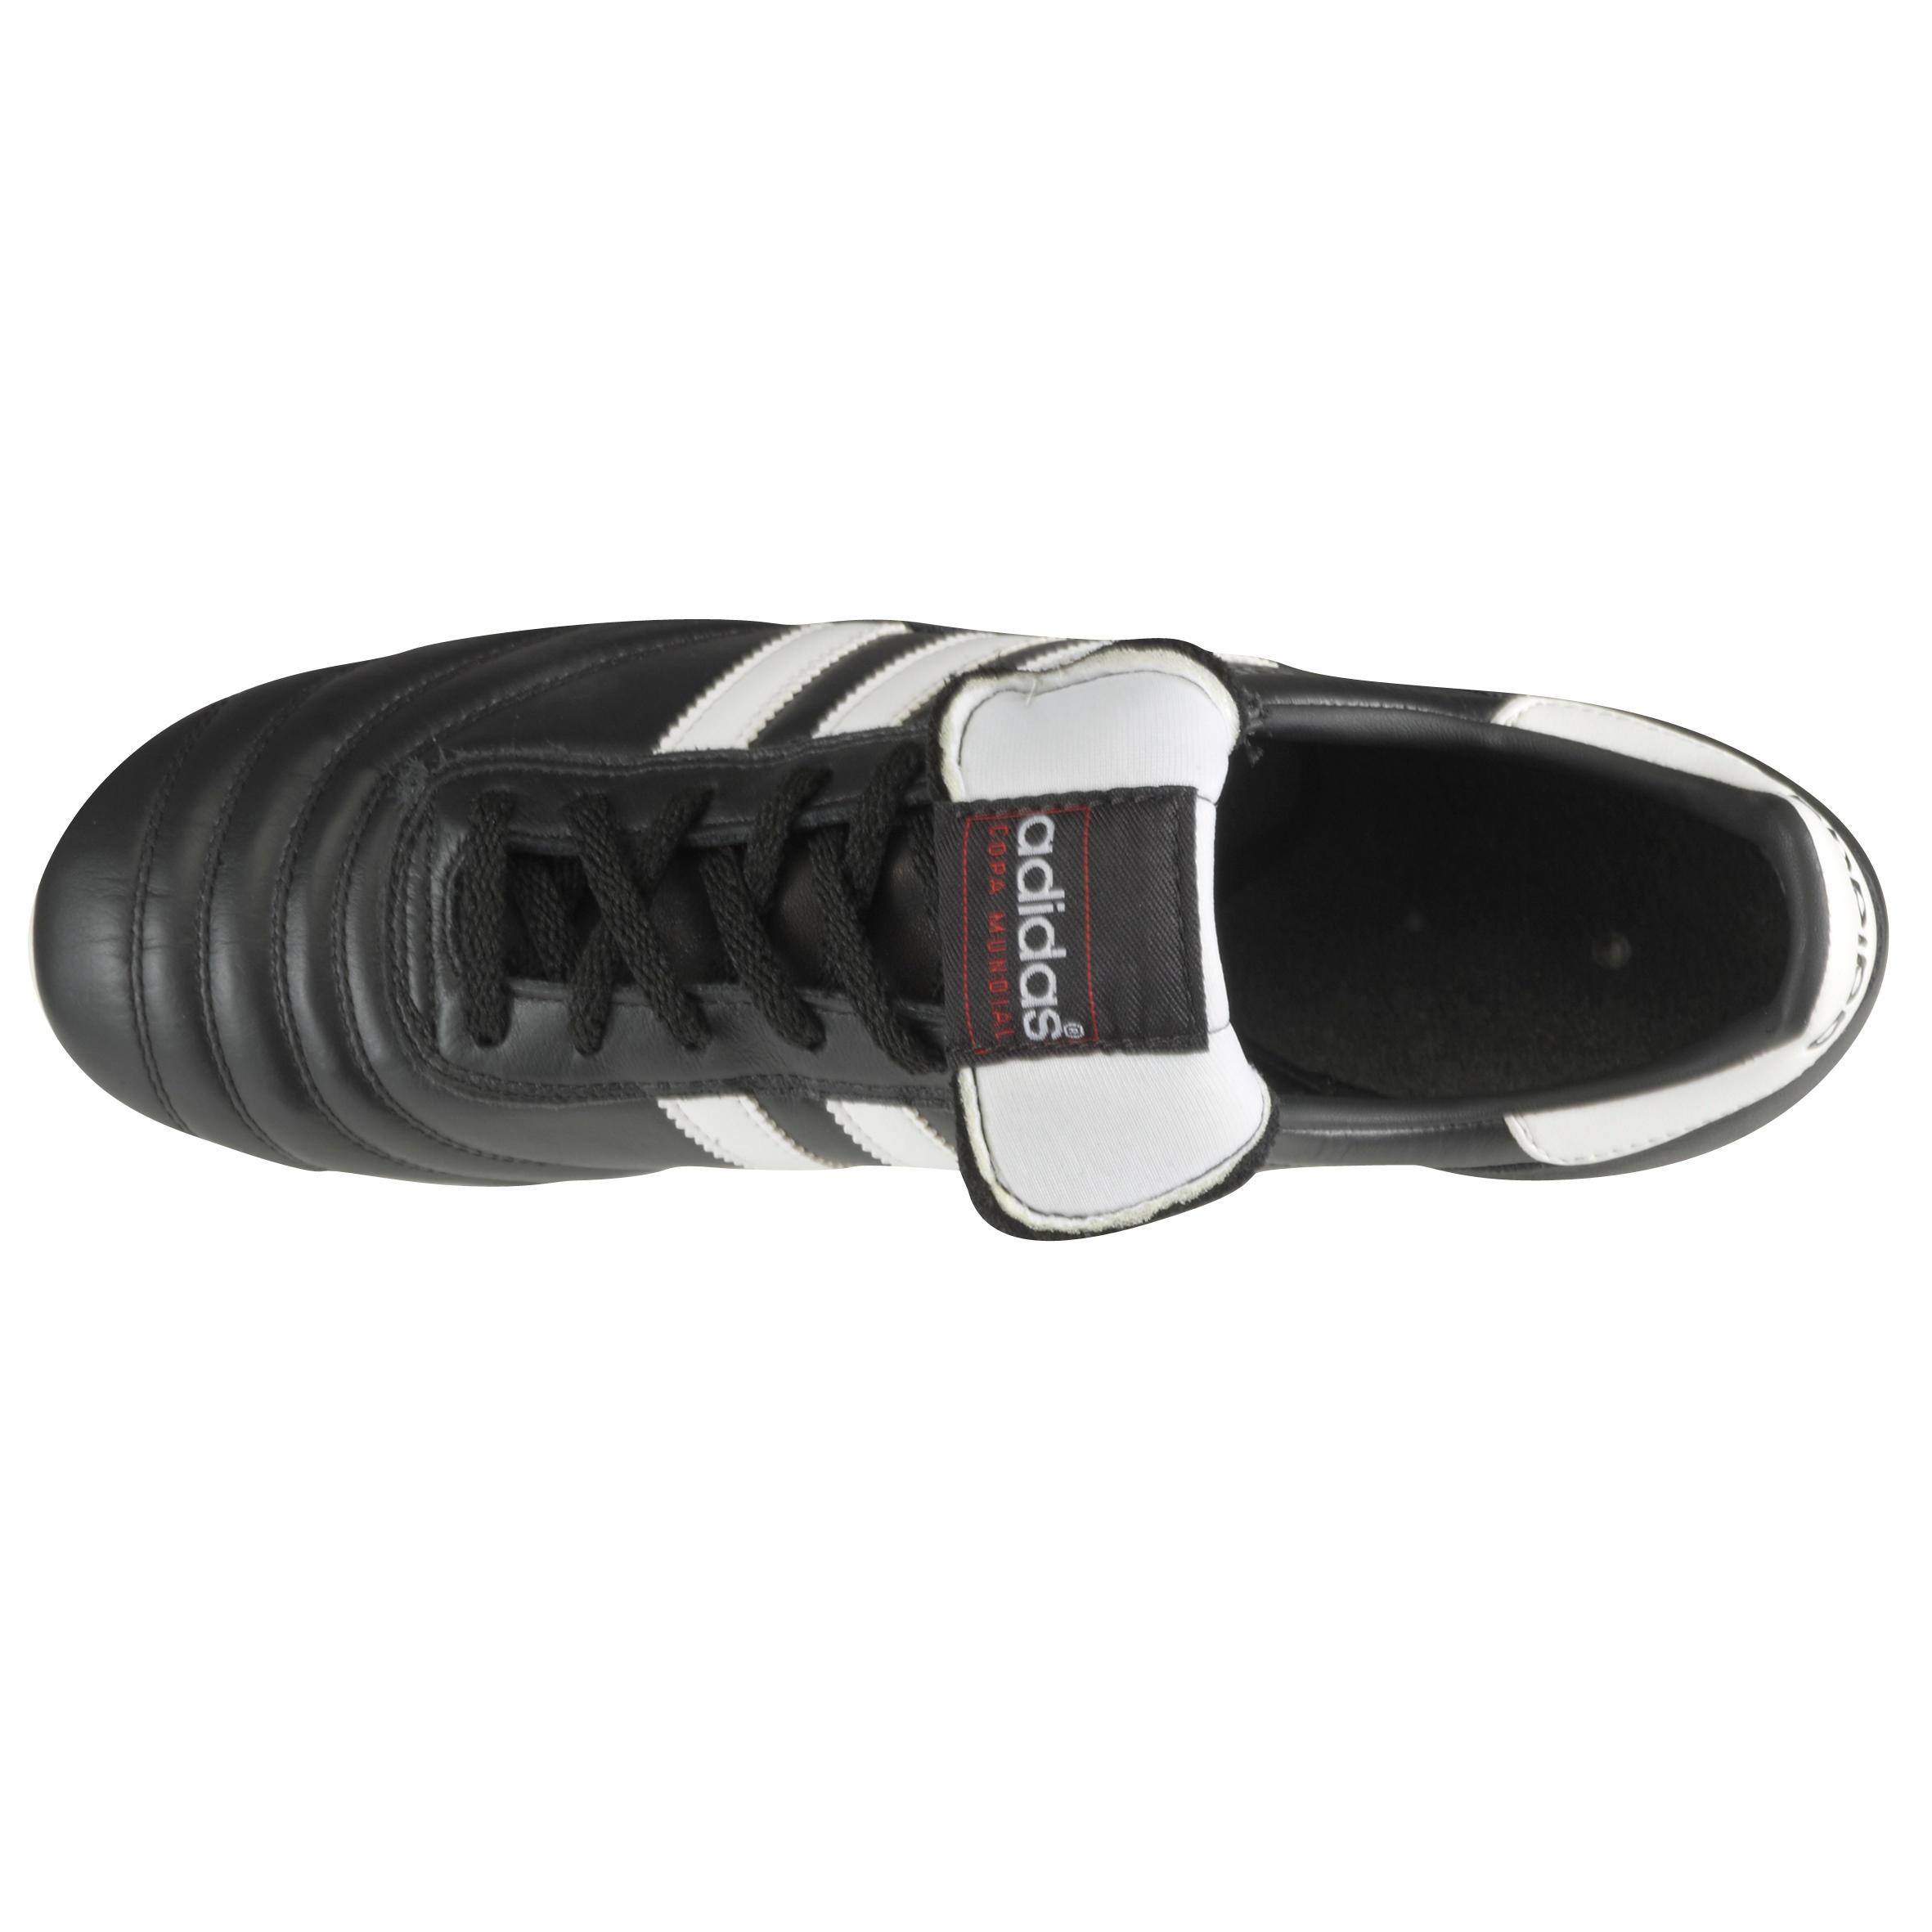 Chaussure football Copa Mundial FG ADIDAS adulte ADIDAS   Decathlon